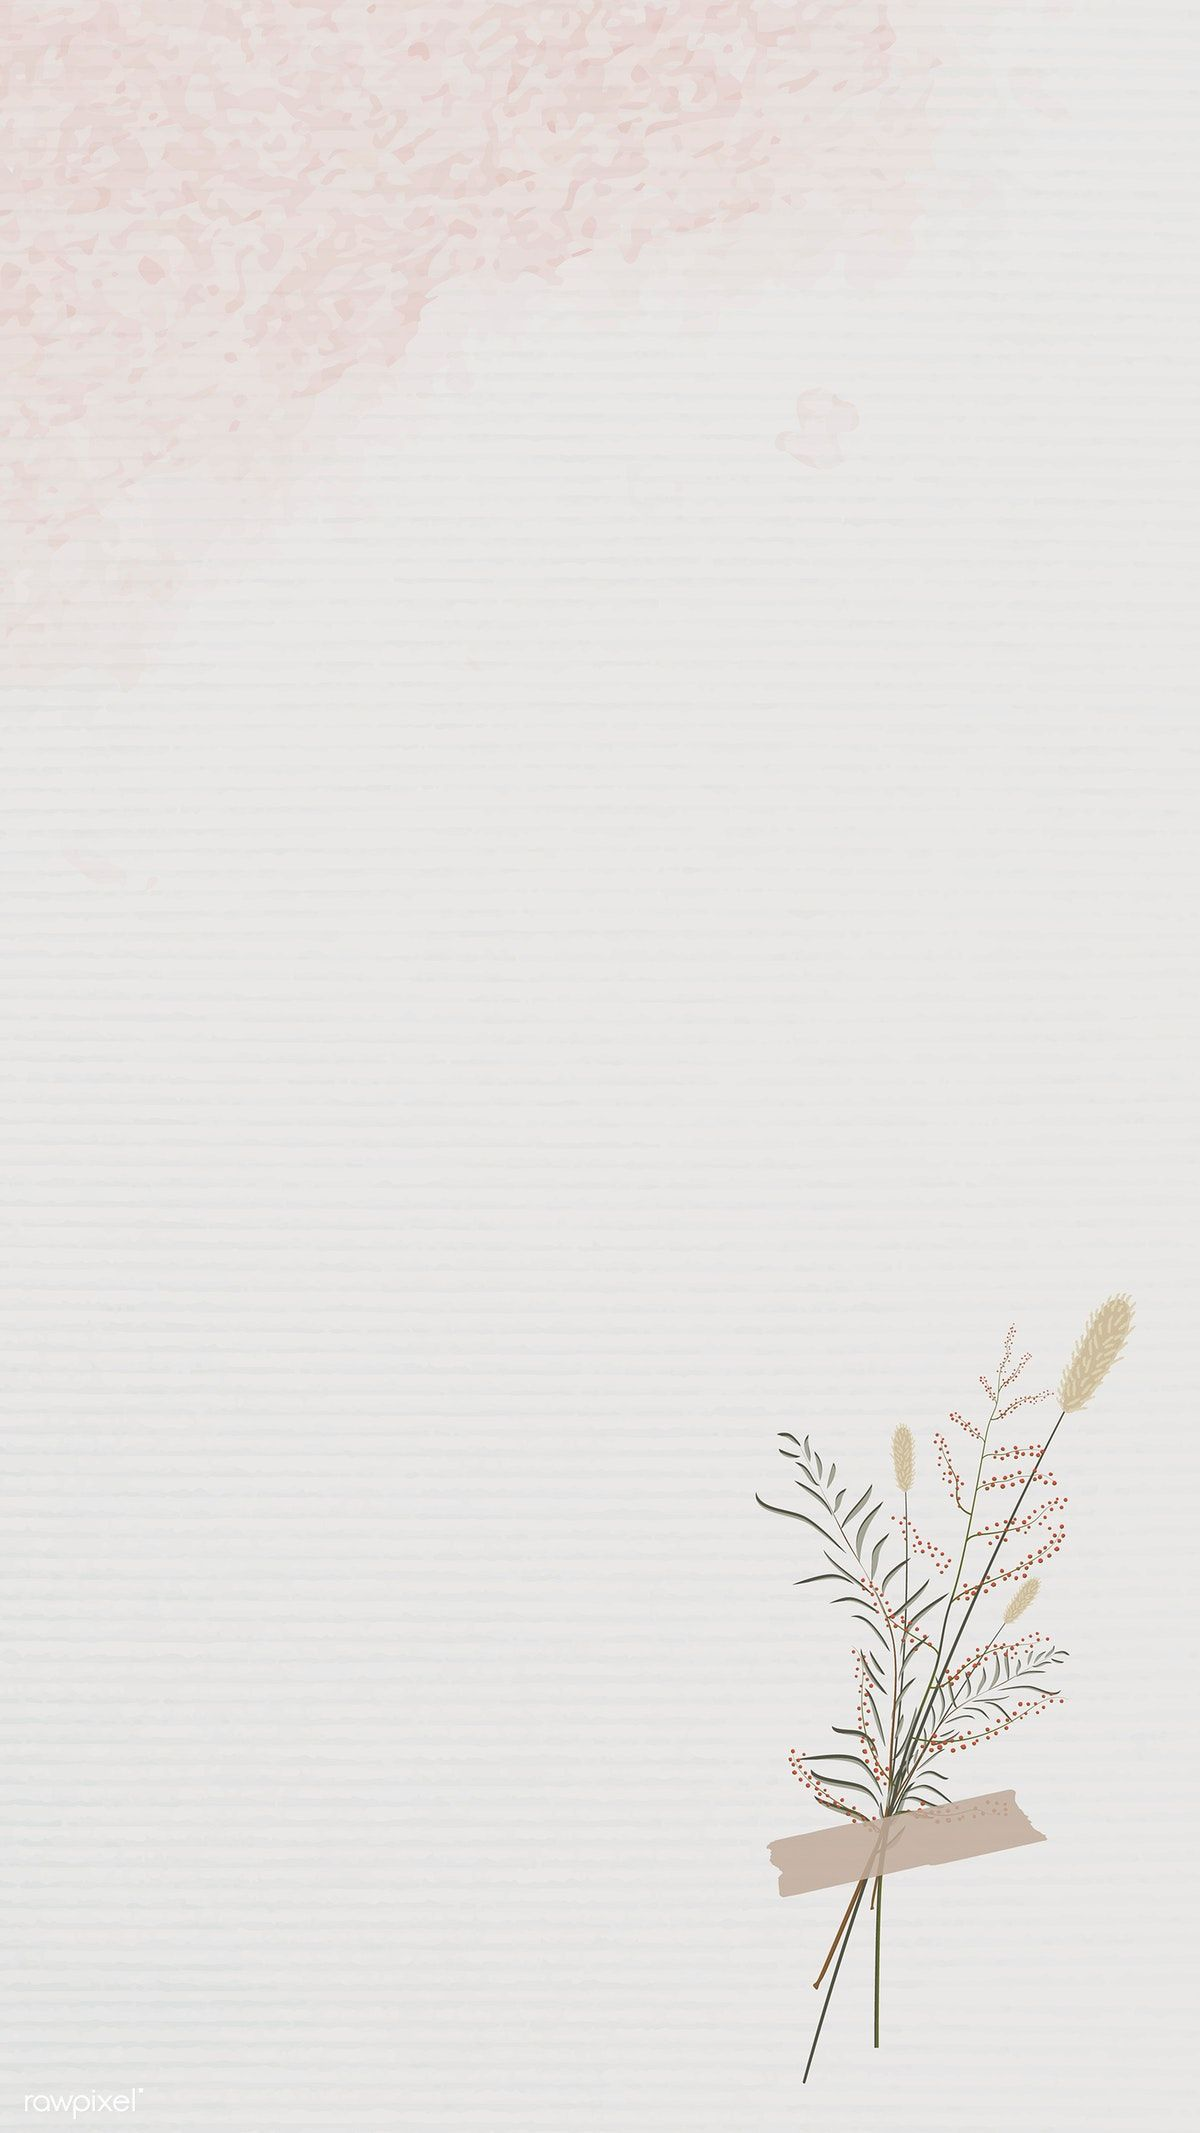 Download premium vector of Vintage leaves design background mobile phone